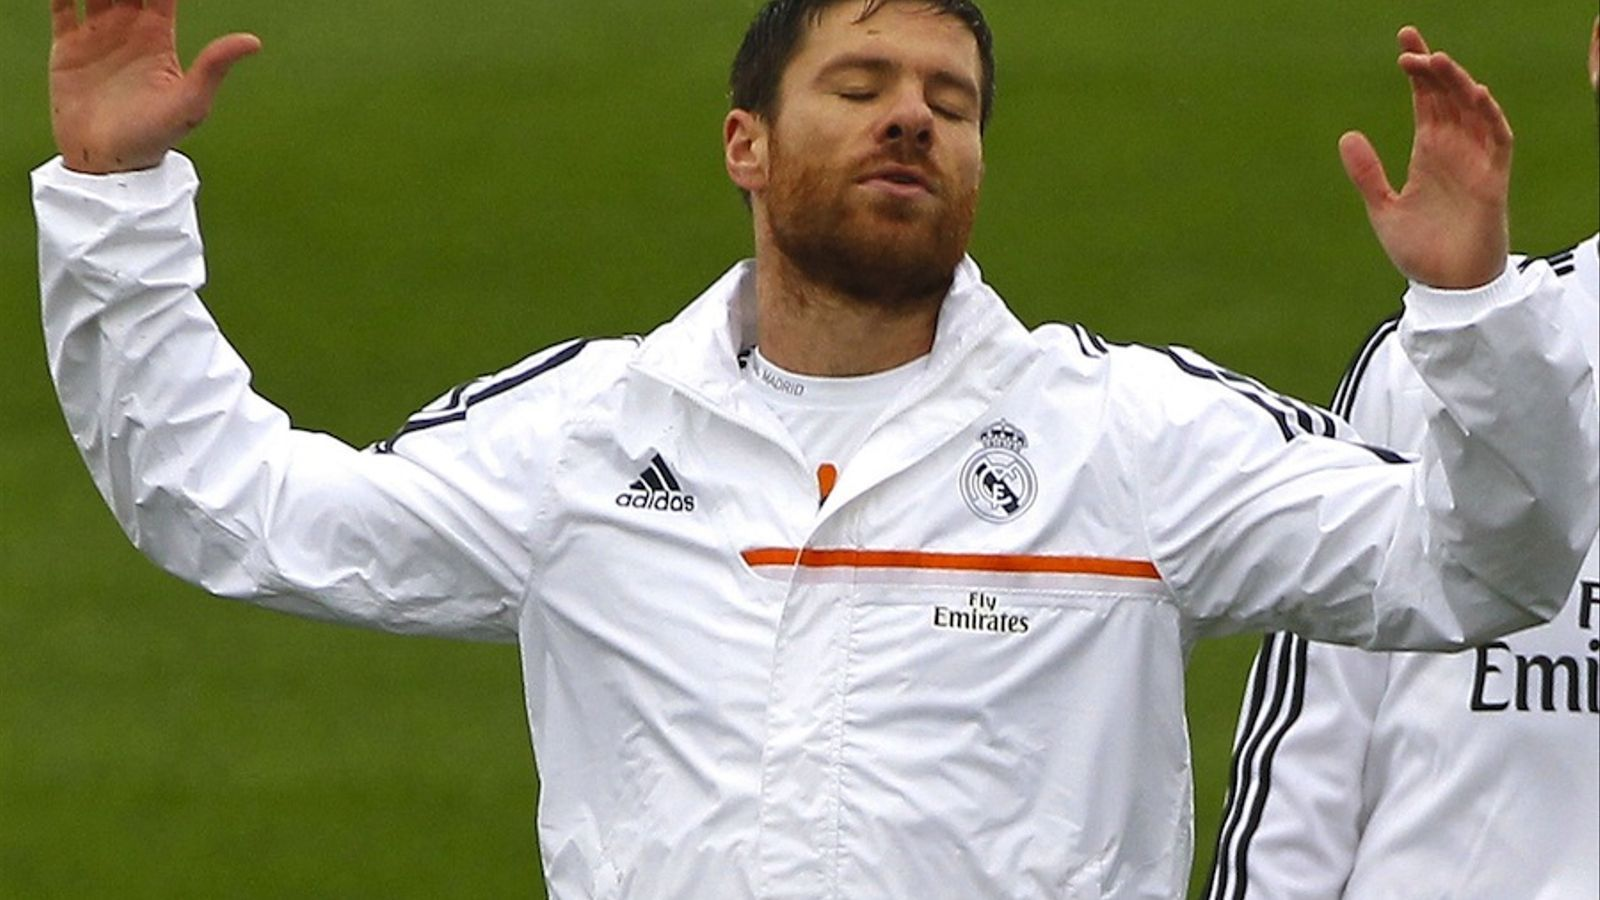 Xabi Alonso, durant un entrenament del Reial Madrid / KIKO HUESCA / EFE